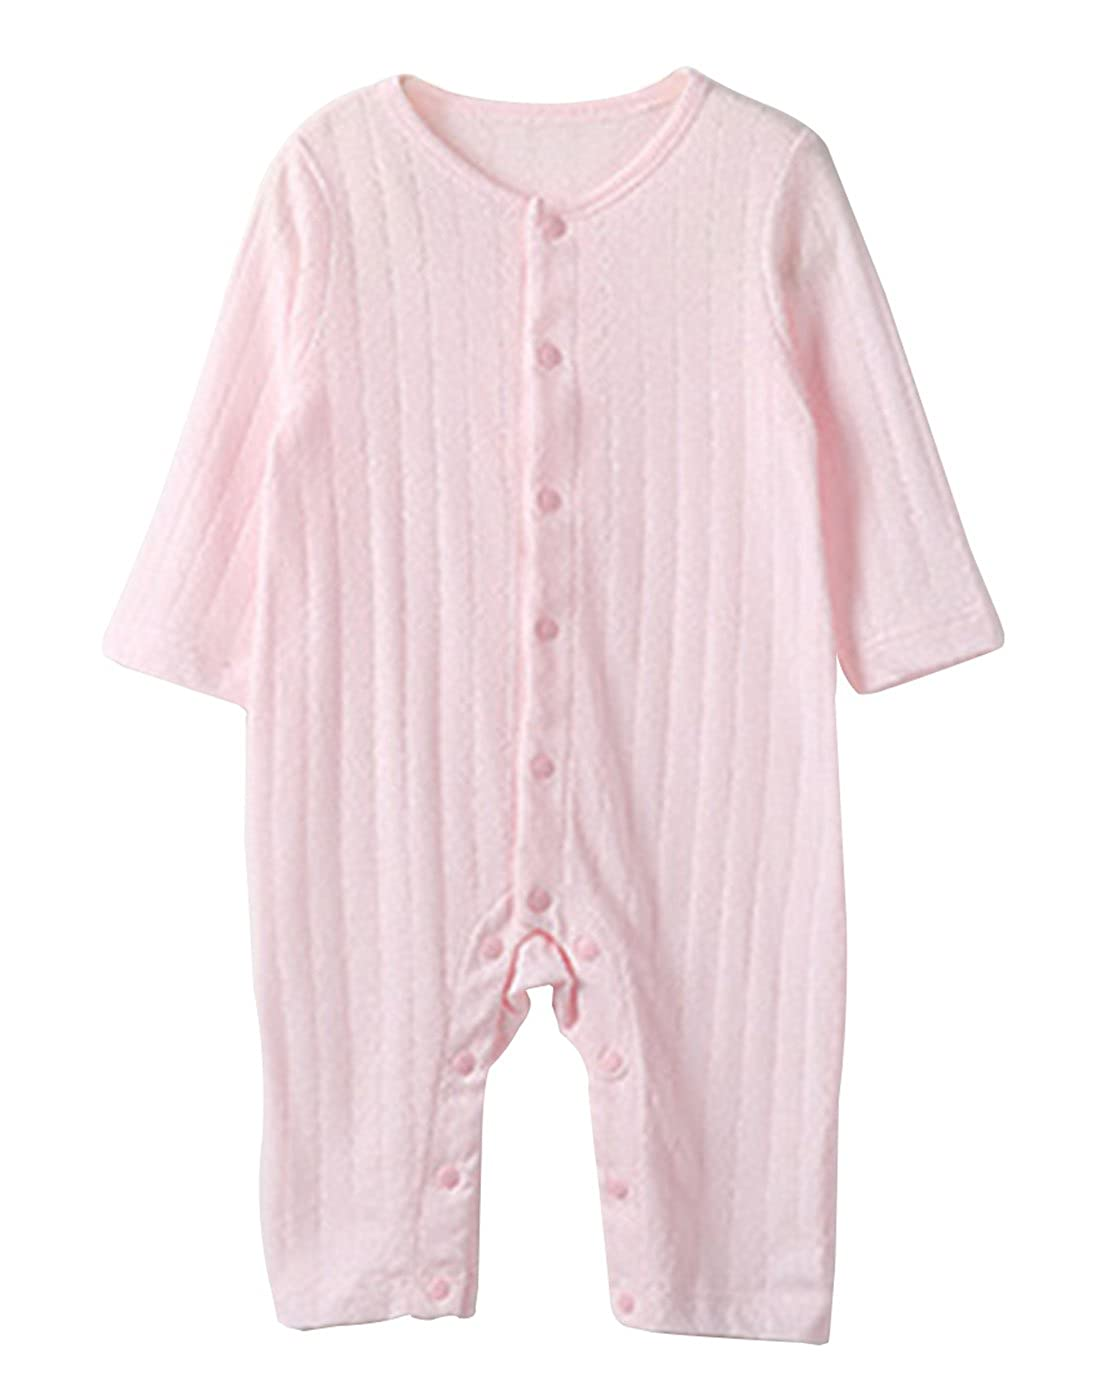 Aivtalk Baby Unisex Solid Romper Long Sleeve 100% Cotton Jumpsuit